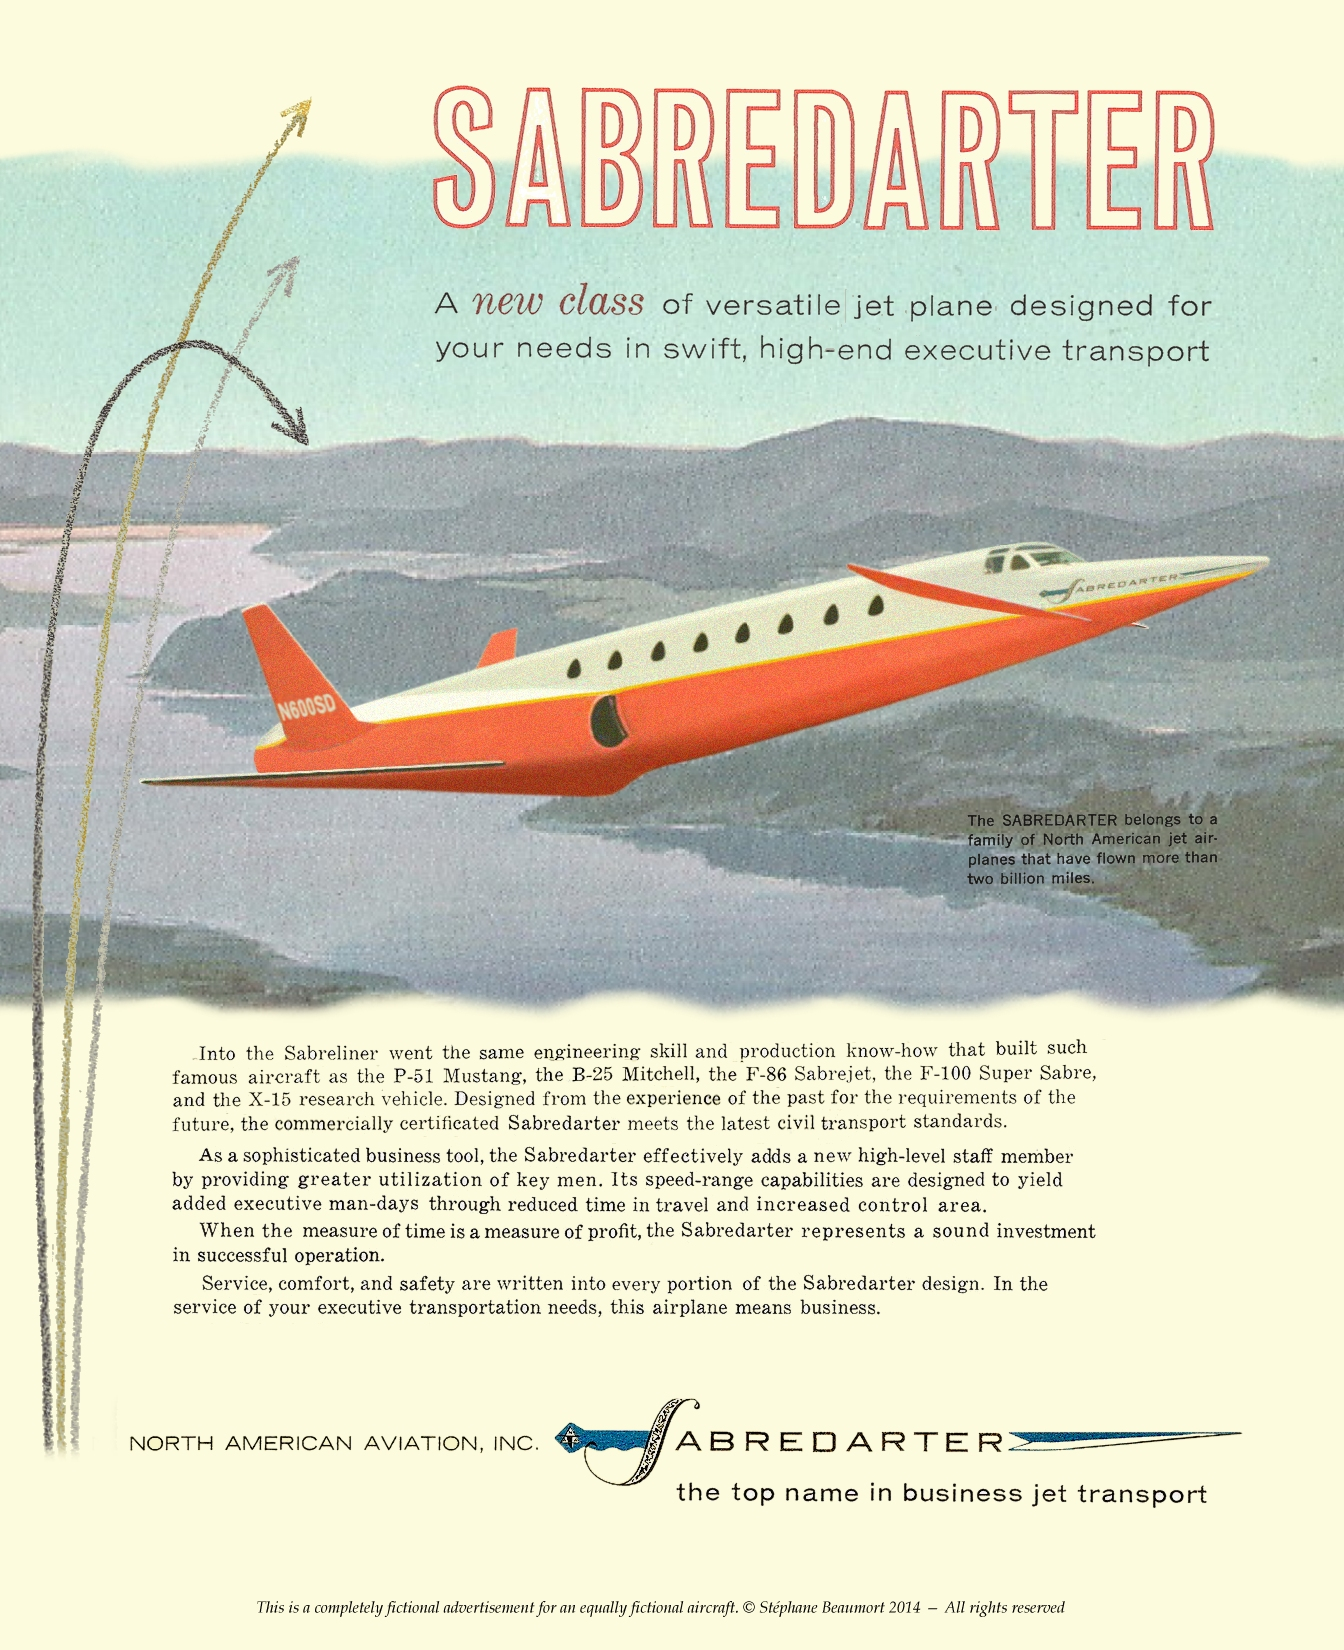 North American Saberdarter